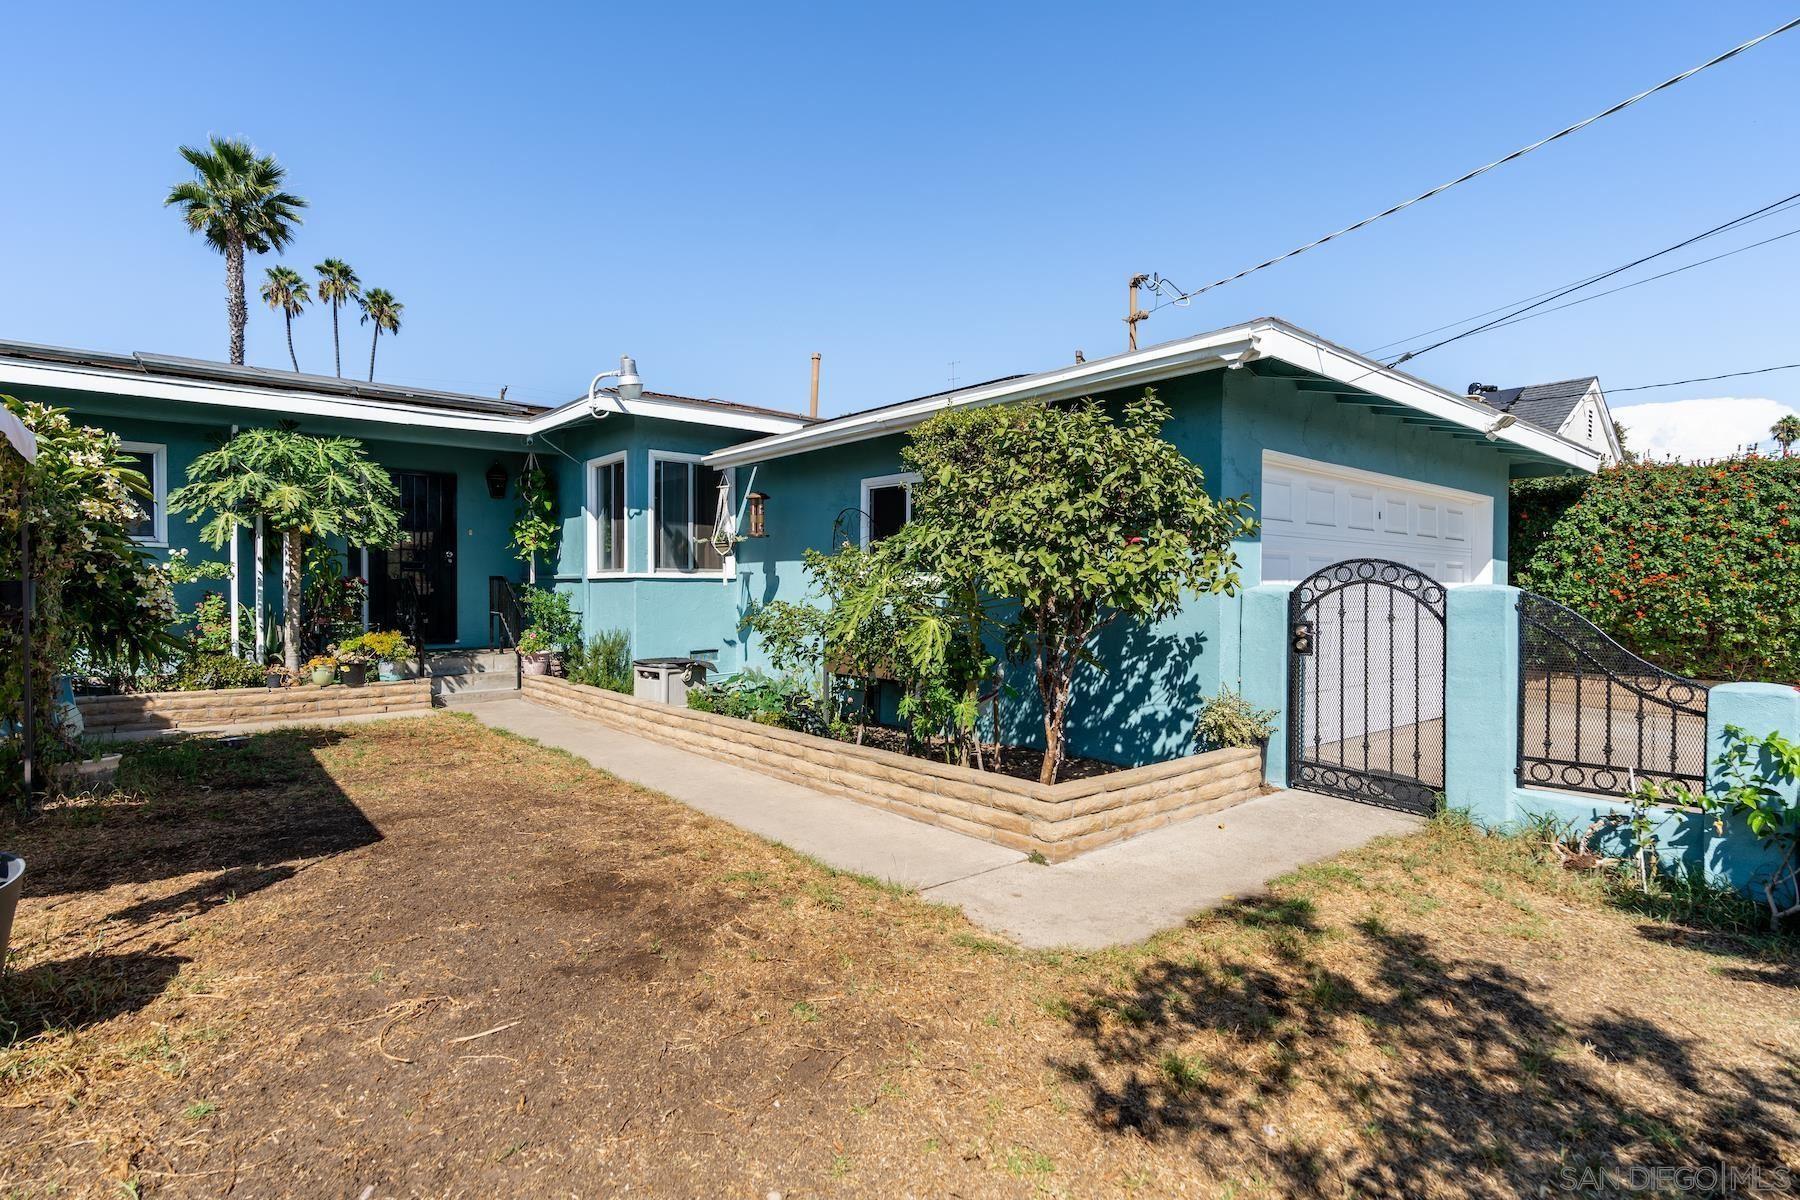 5238 Reynolds St., San Diego, CA 92114 - MLS#: 210026858